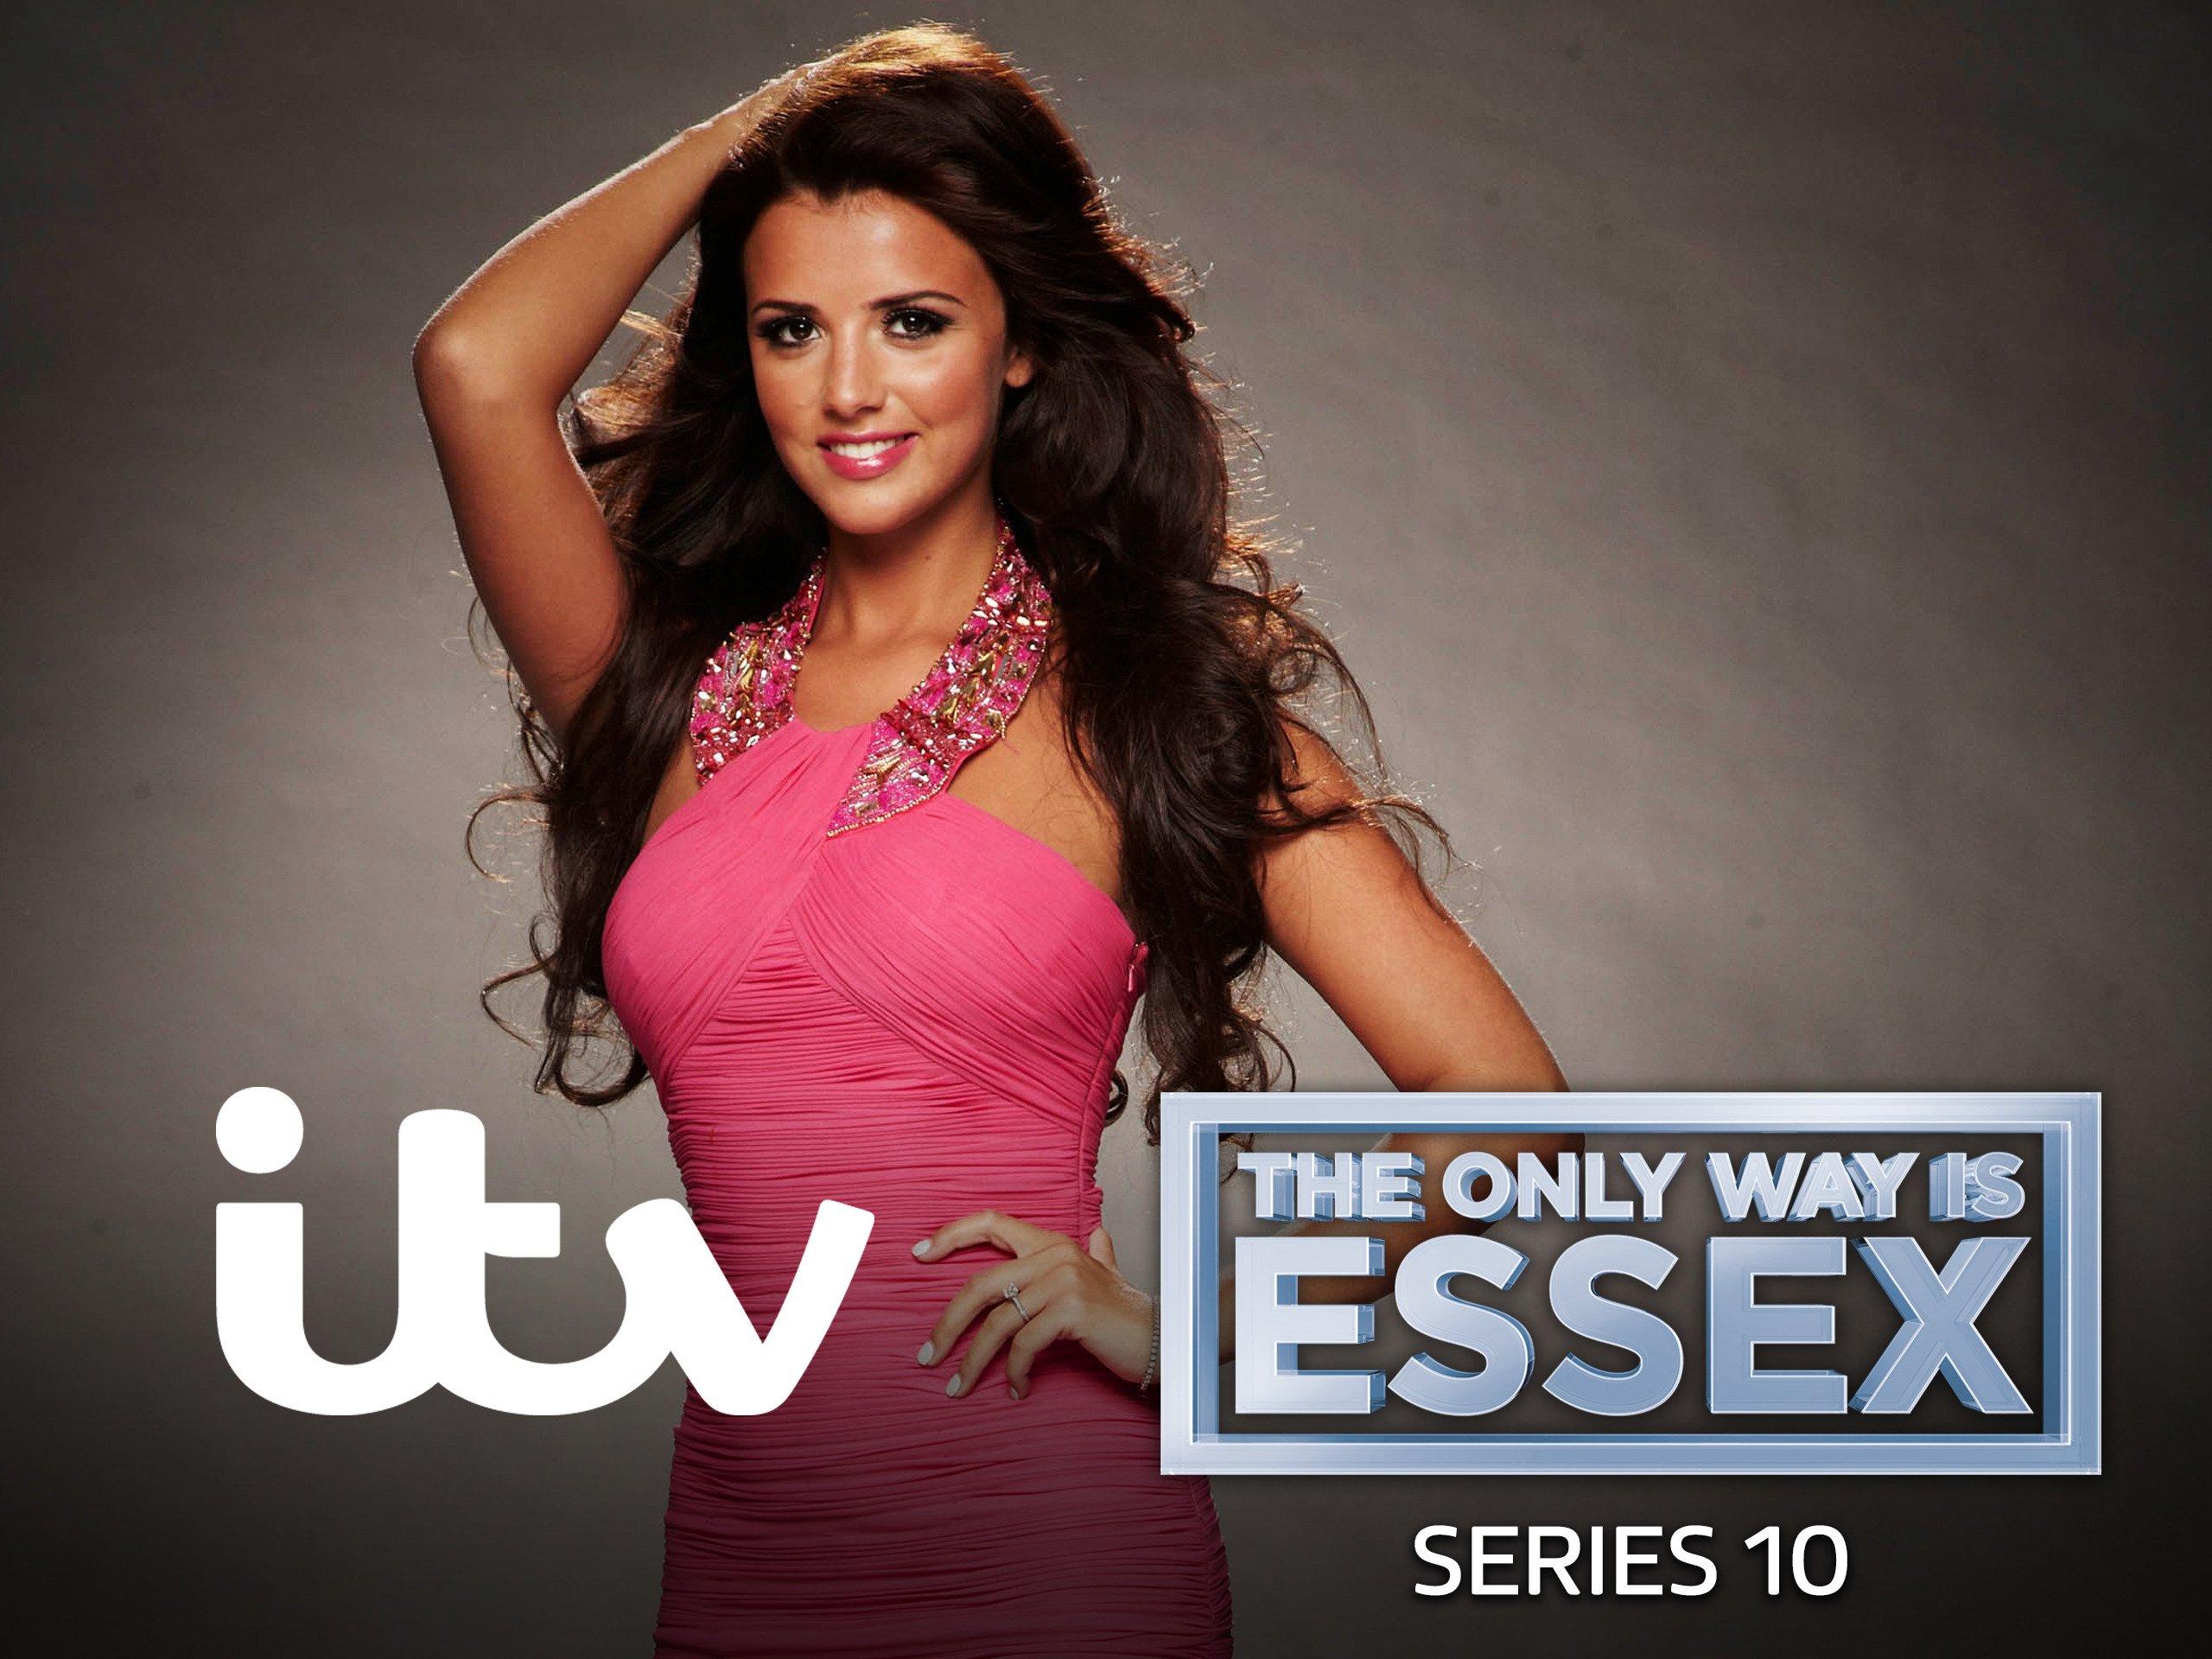 only way is essex season 21 episode 11